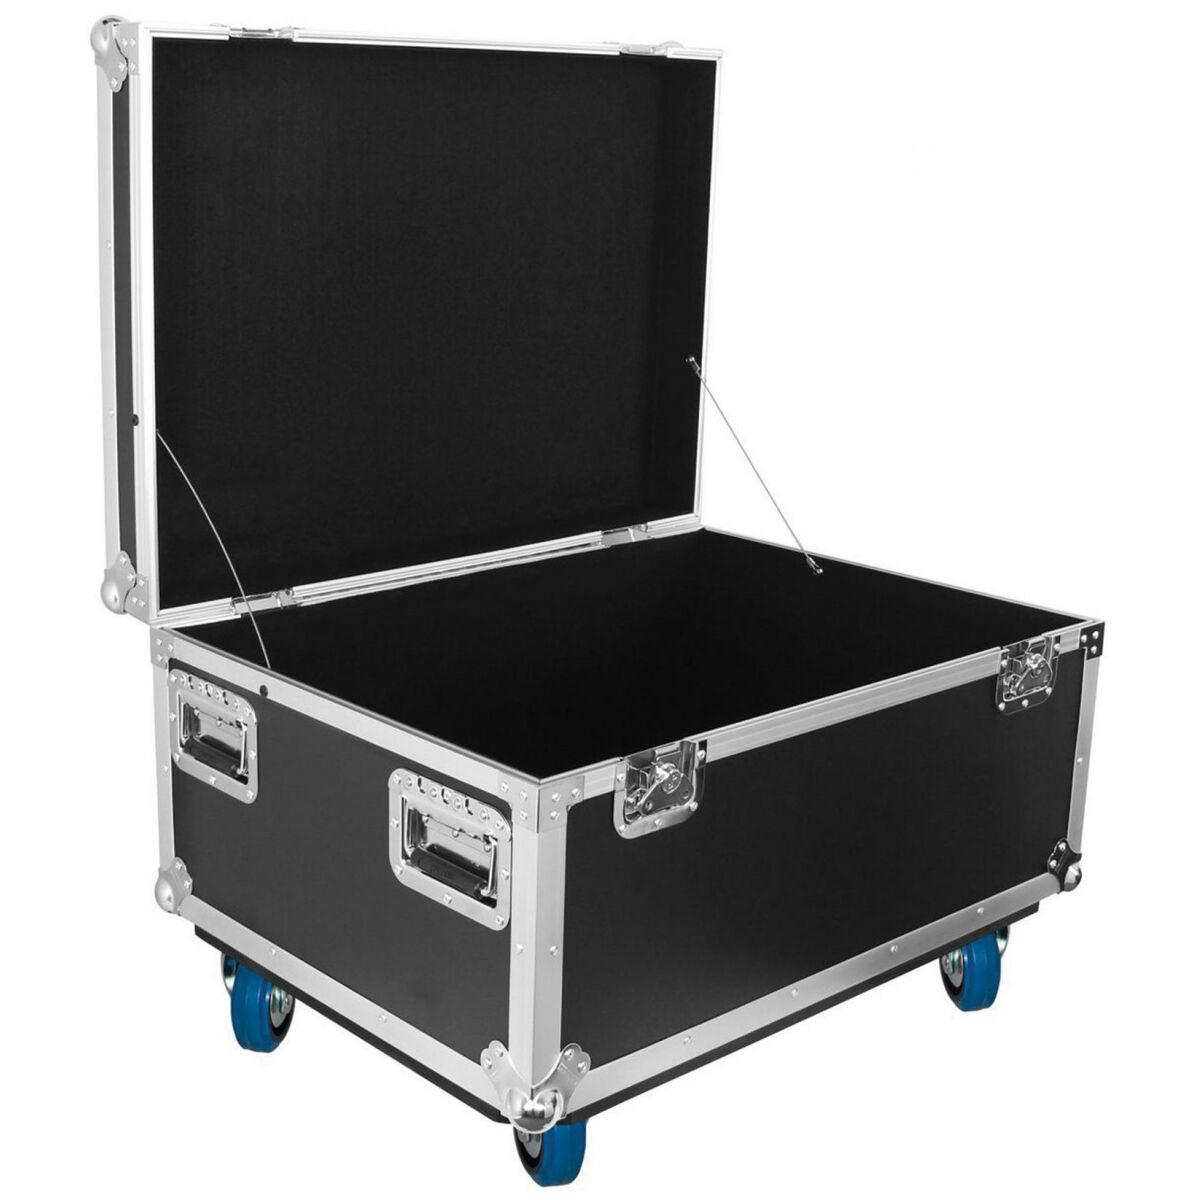 Power Acoustics - Flight cases FT L MK2